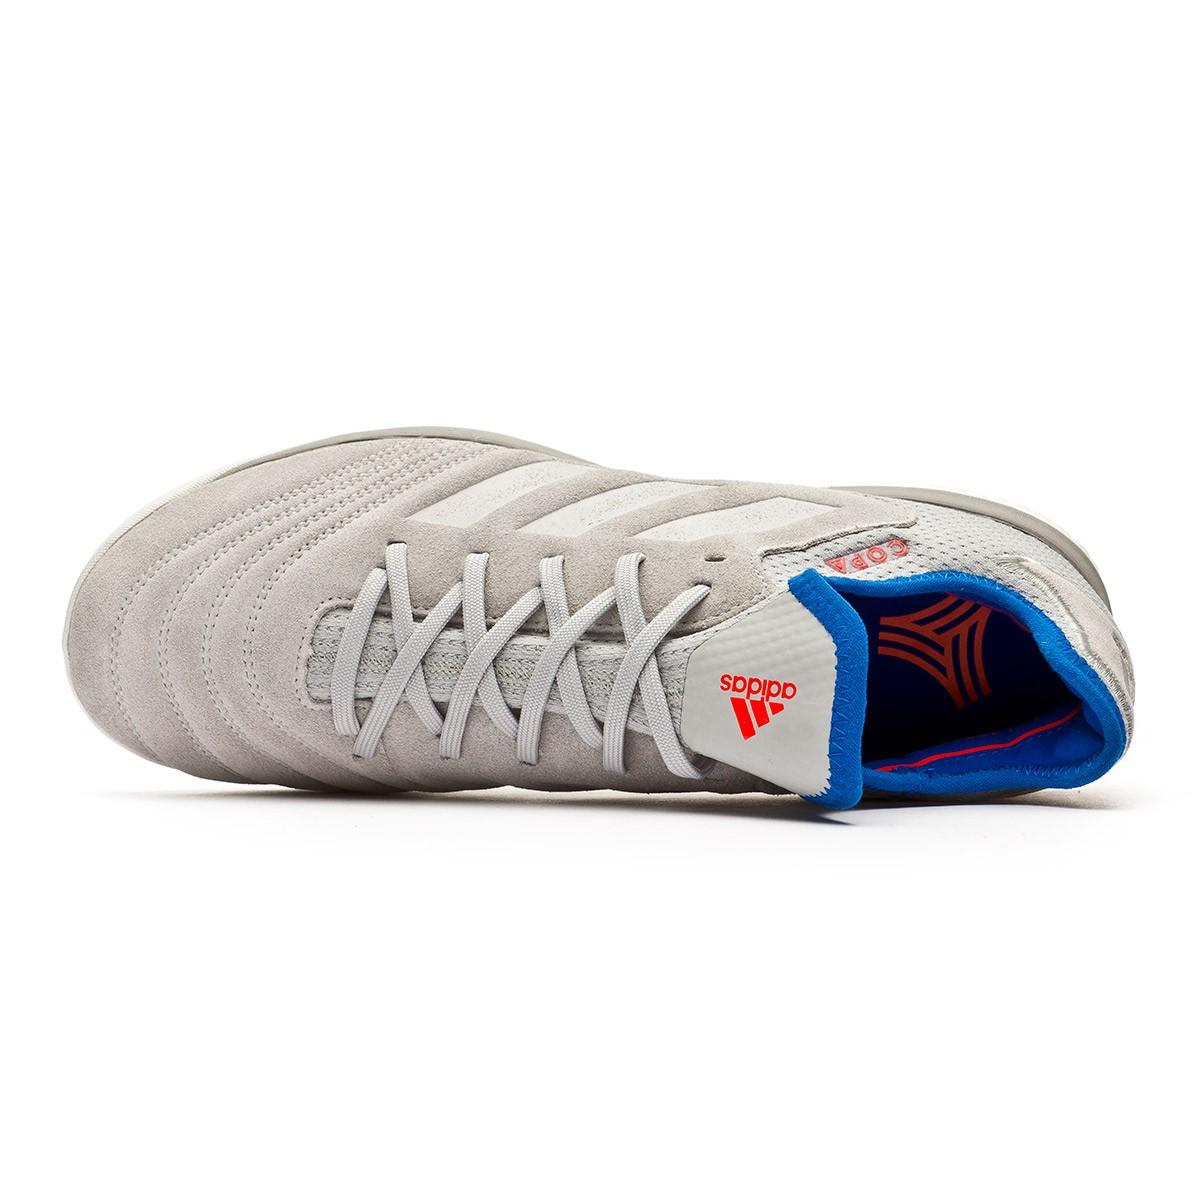 Zapatilla adidas Copa Tango 18.1 TR Grey-Football blue - Leaked soccer 39c868128adf1